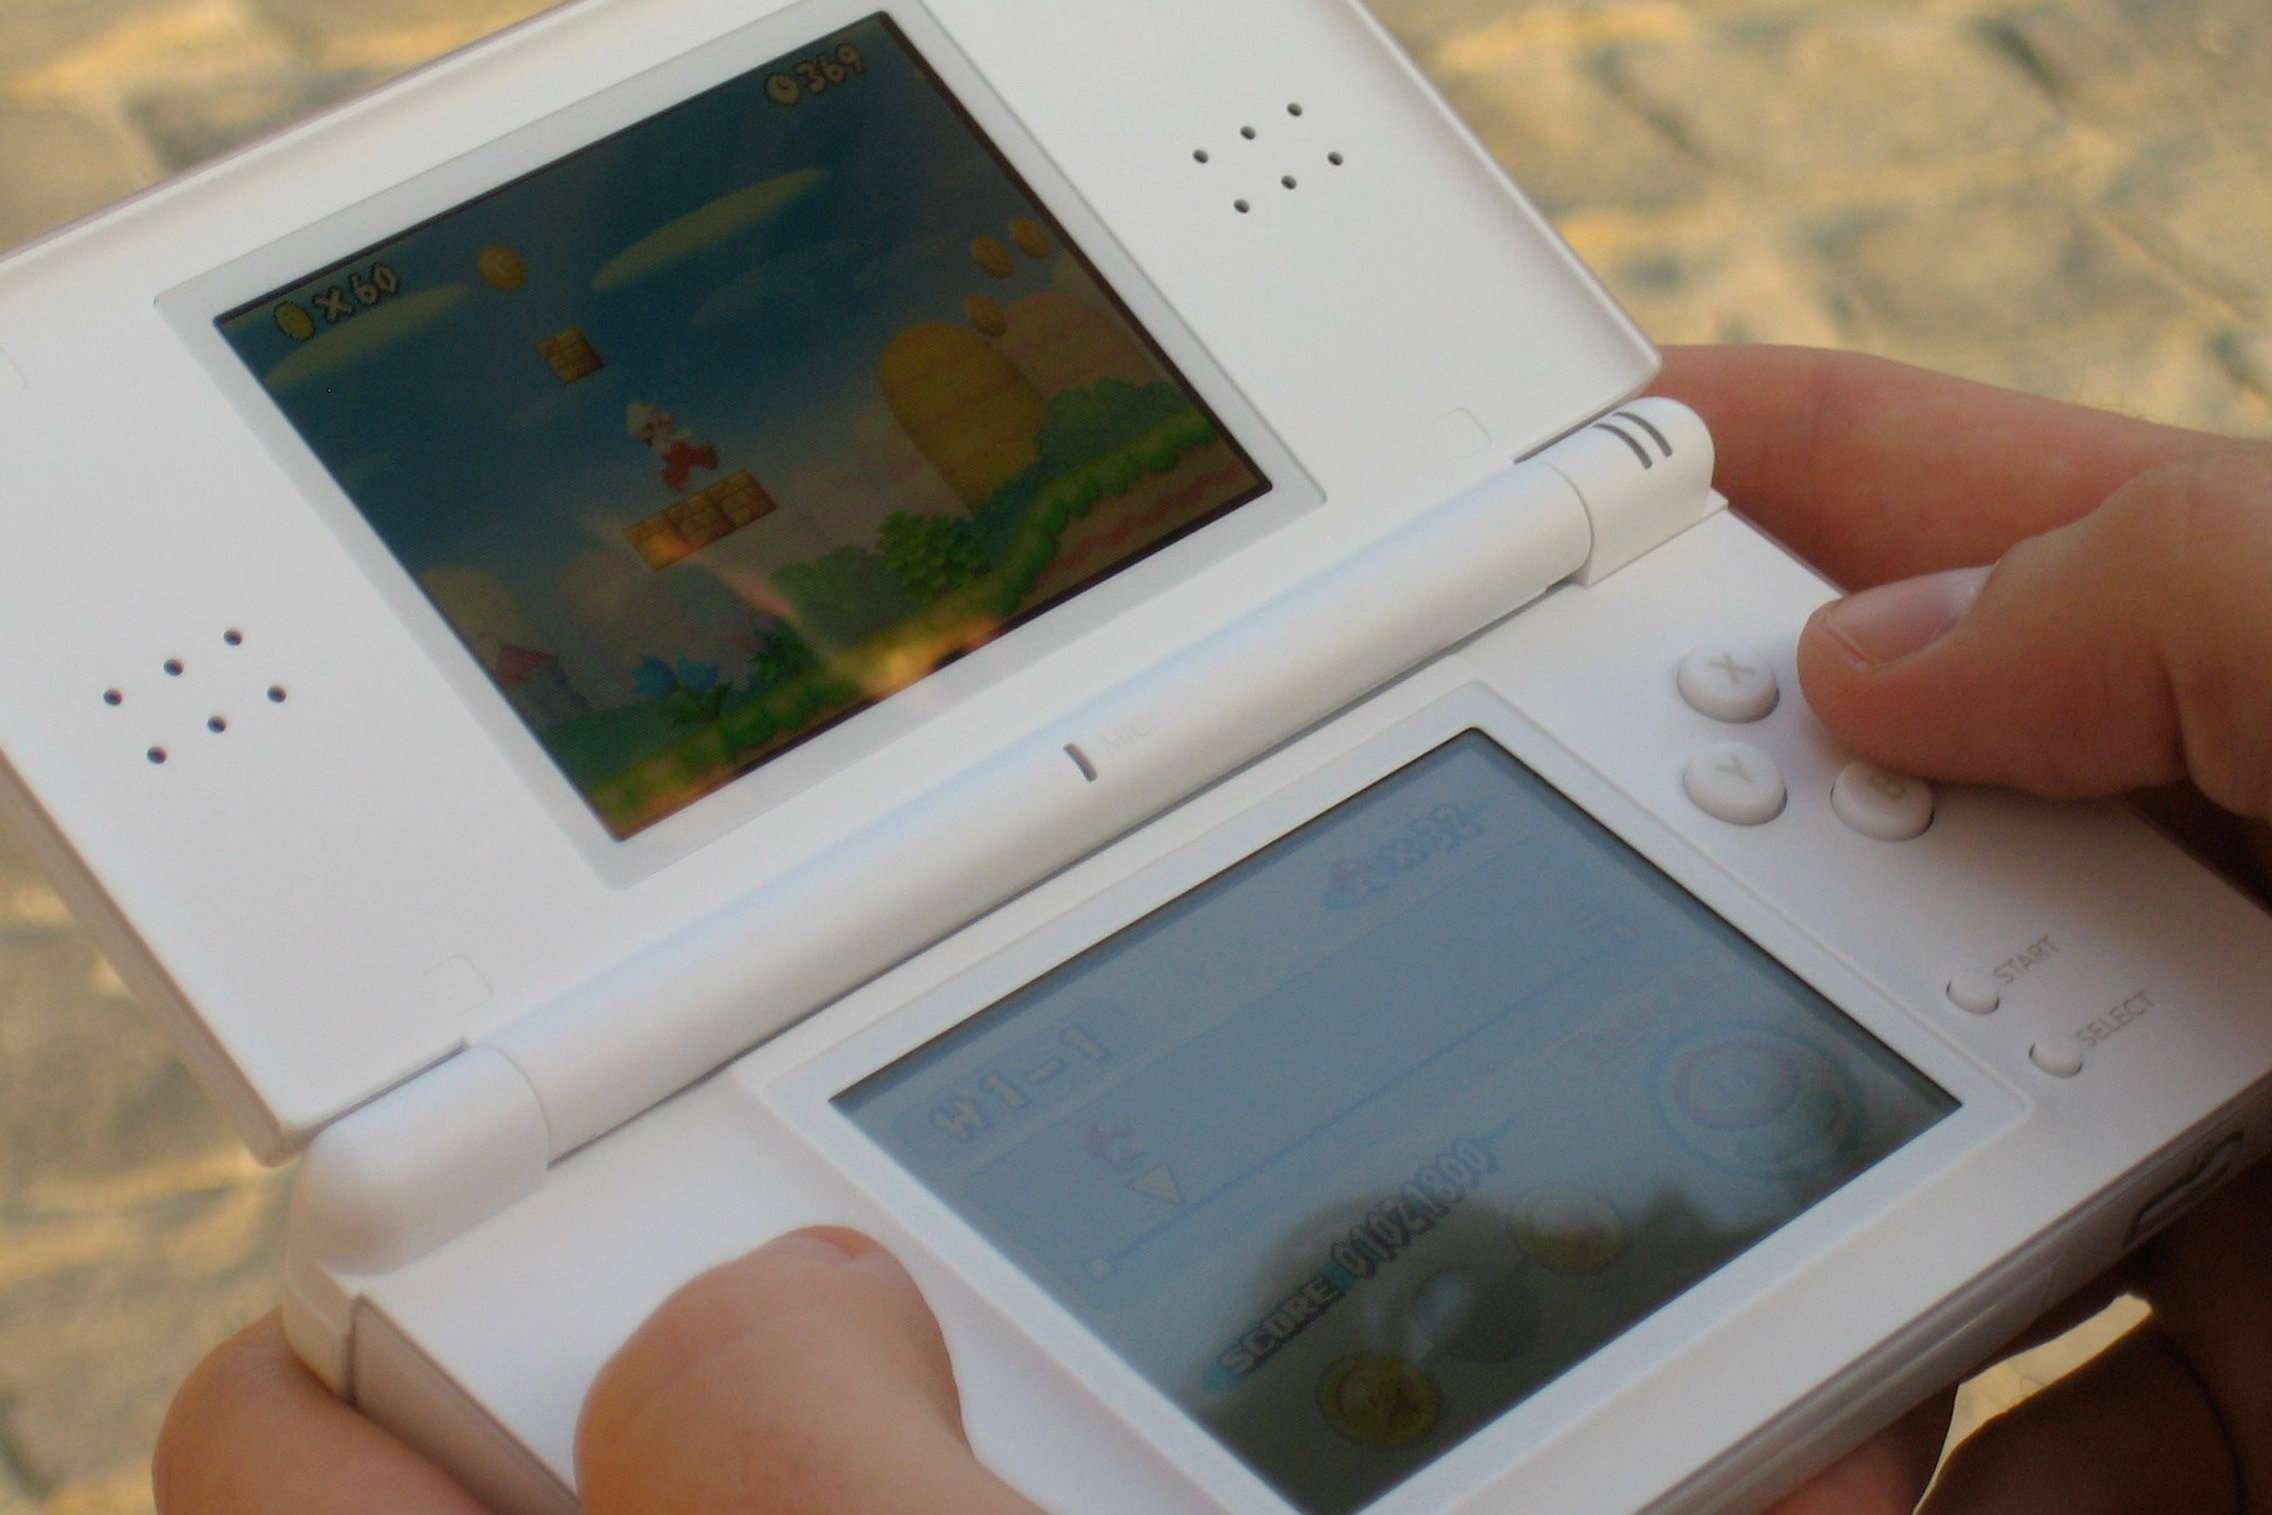 New Super Mario Bros Cheats And Secrets On Nintendo Ds